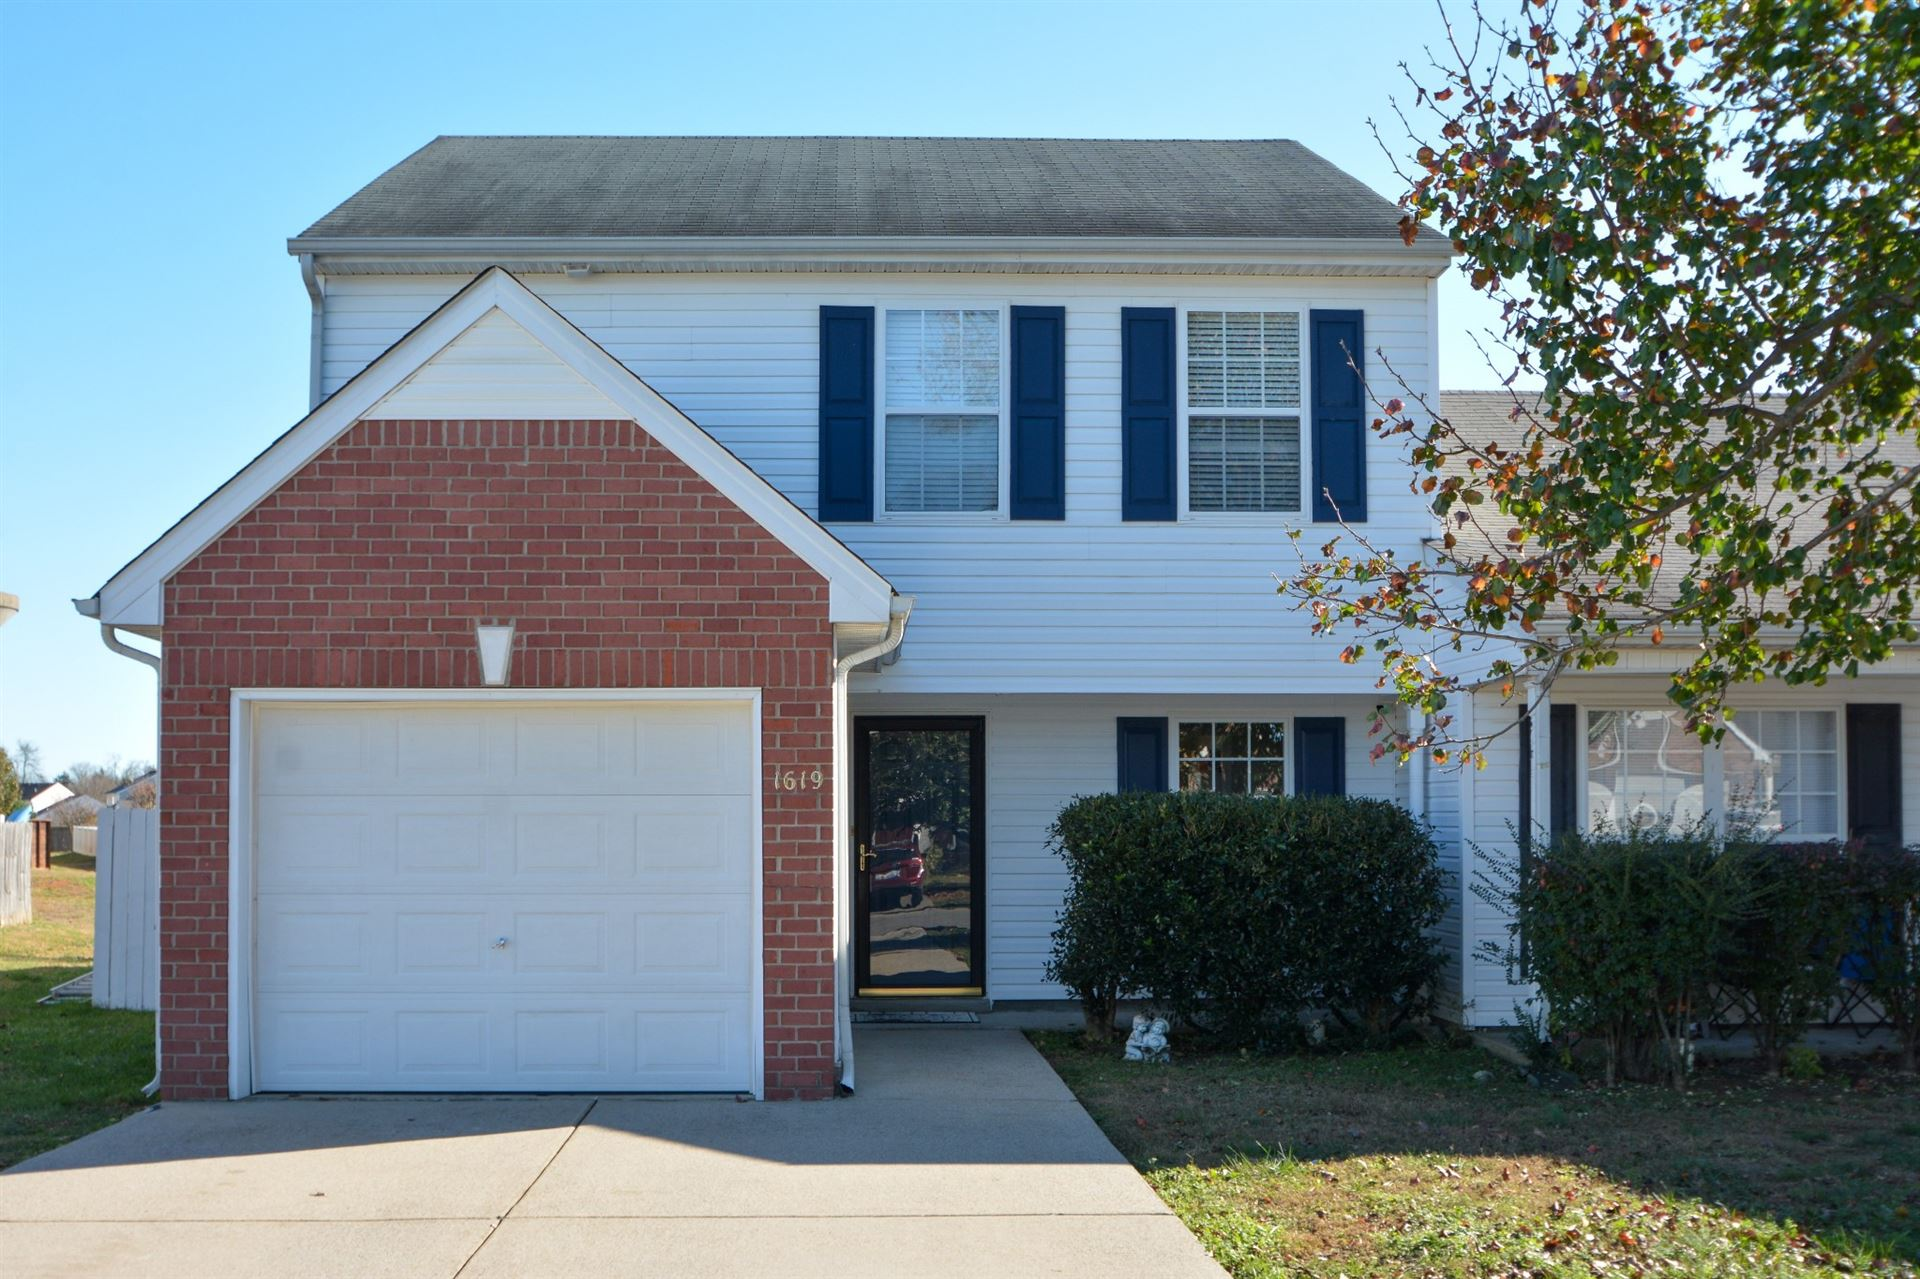 1619 Allston Dr, Murfreesboro, TN 37128 - MLS#: 2208232